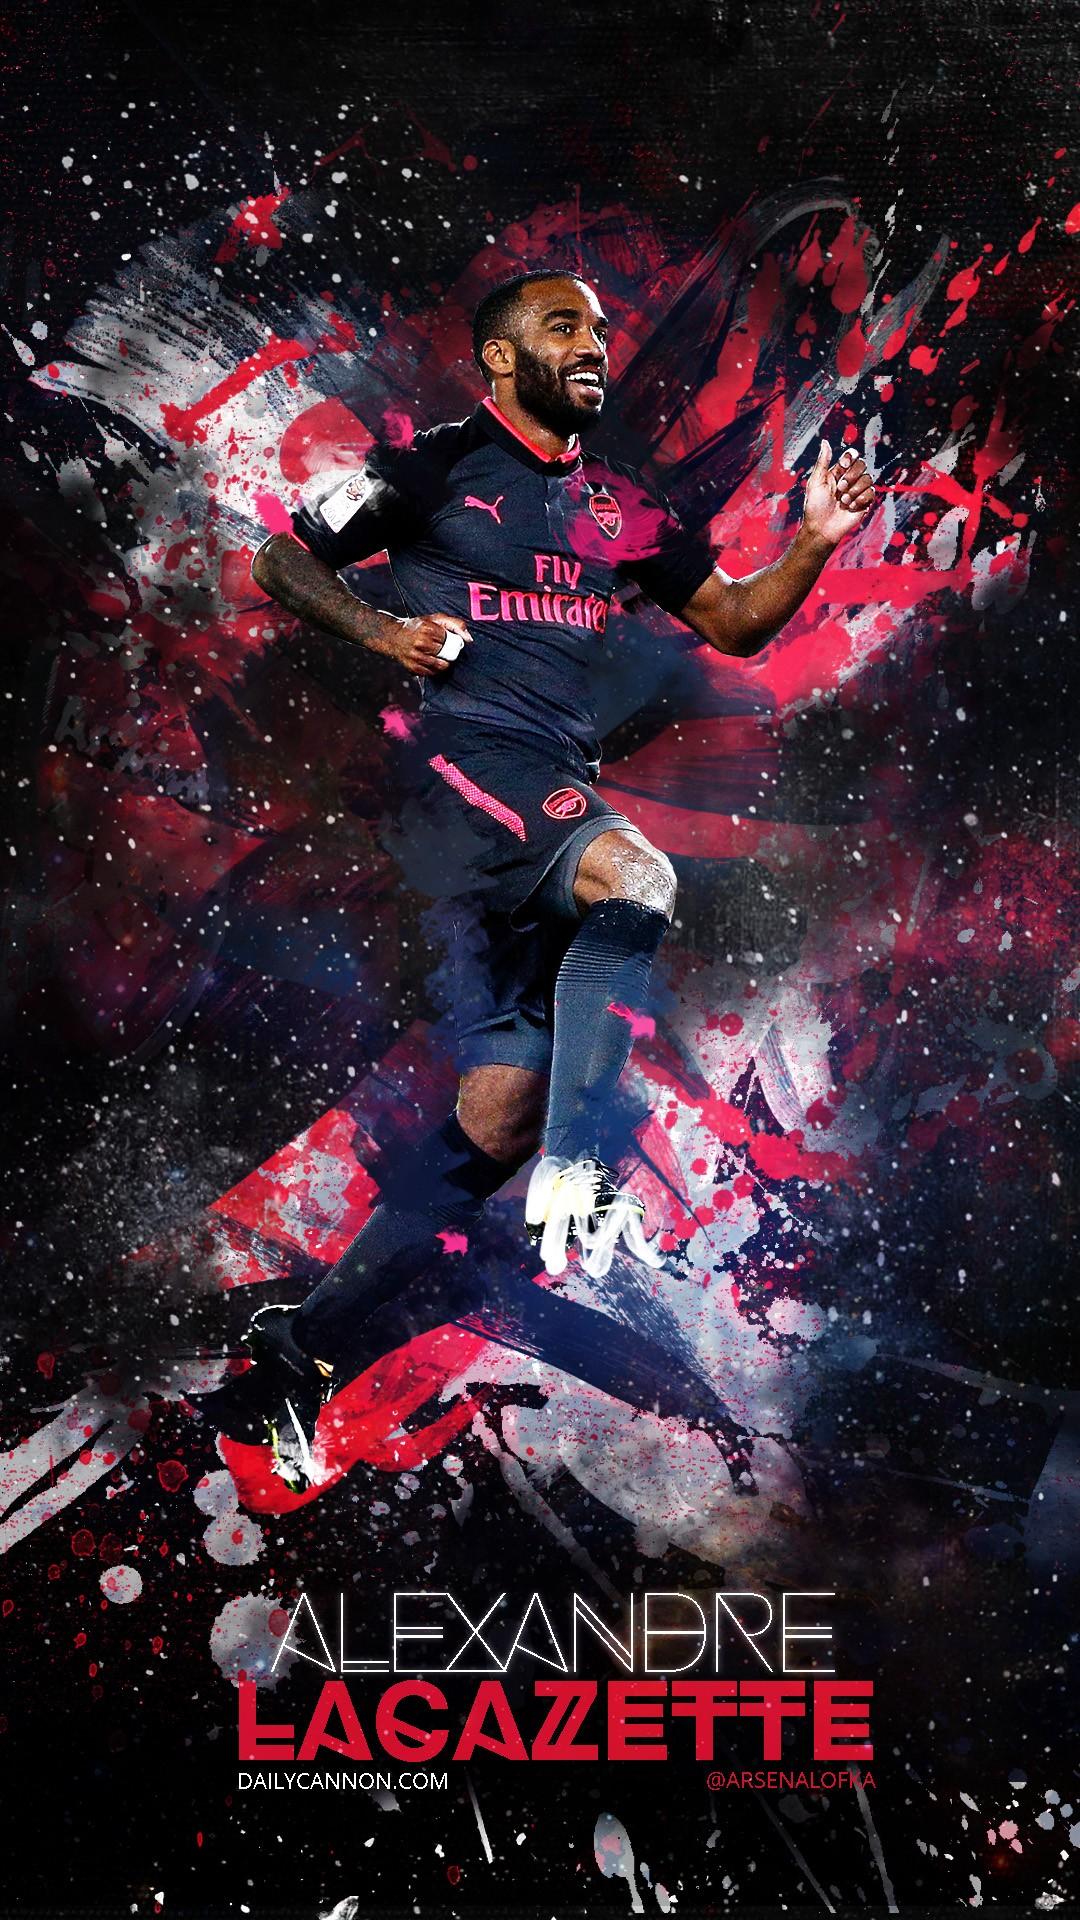 Alexandre Lacazette Arsenal iPhone Wallpaper 2019 3D iPhone 1080x1920